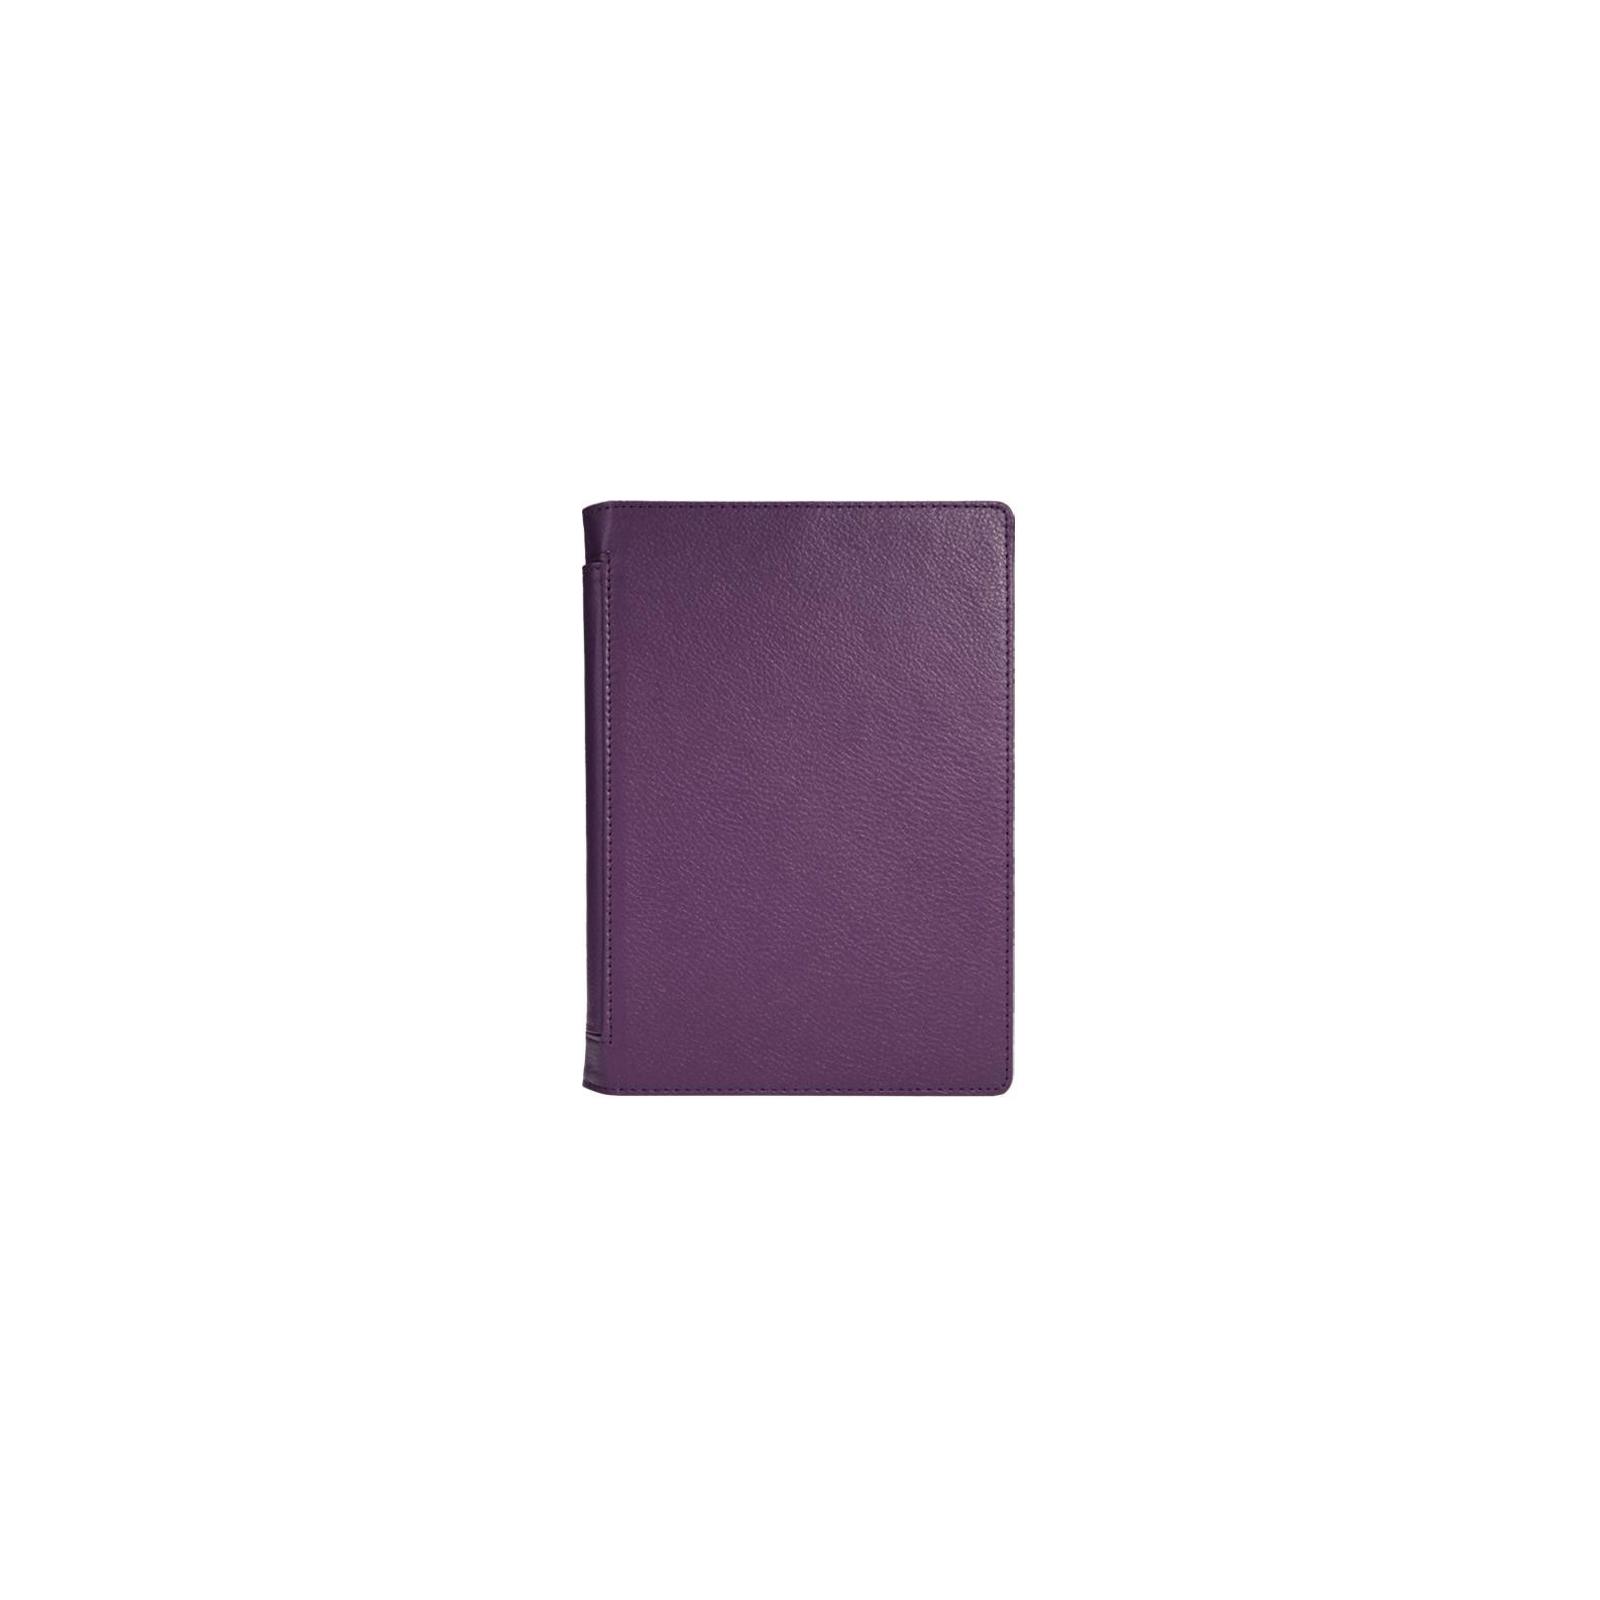 Чехол для планшета AirOn для Lenovo YOGA Tablet 3 8'' violet (4822352779641)